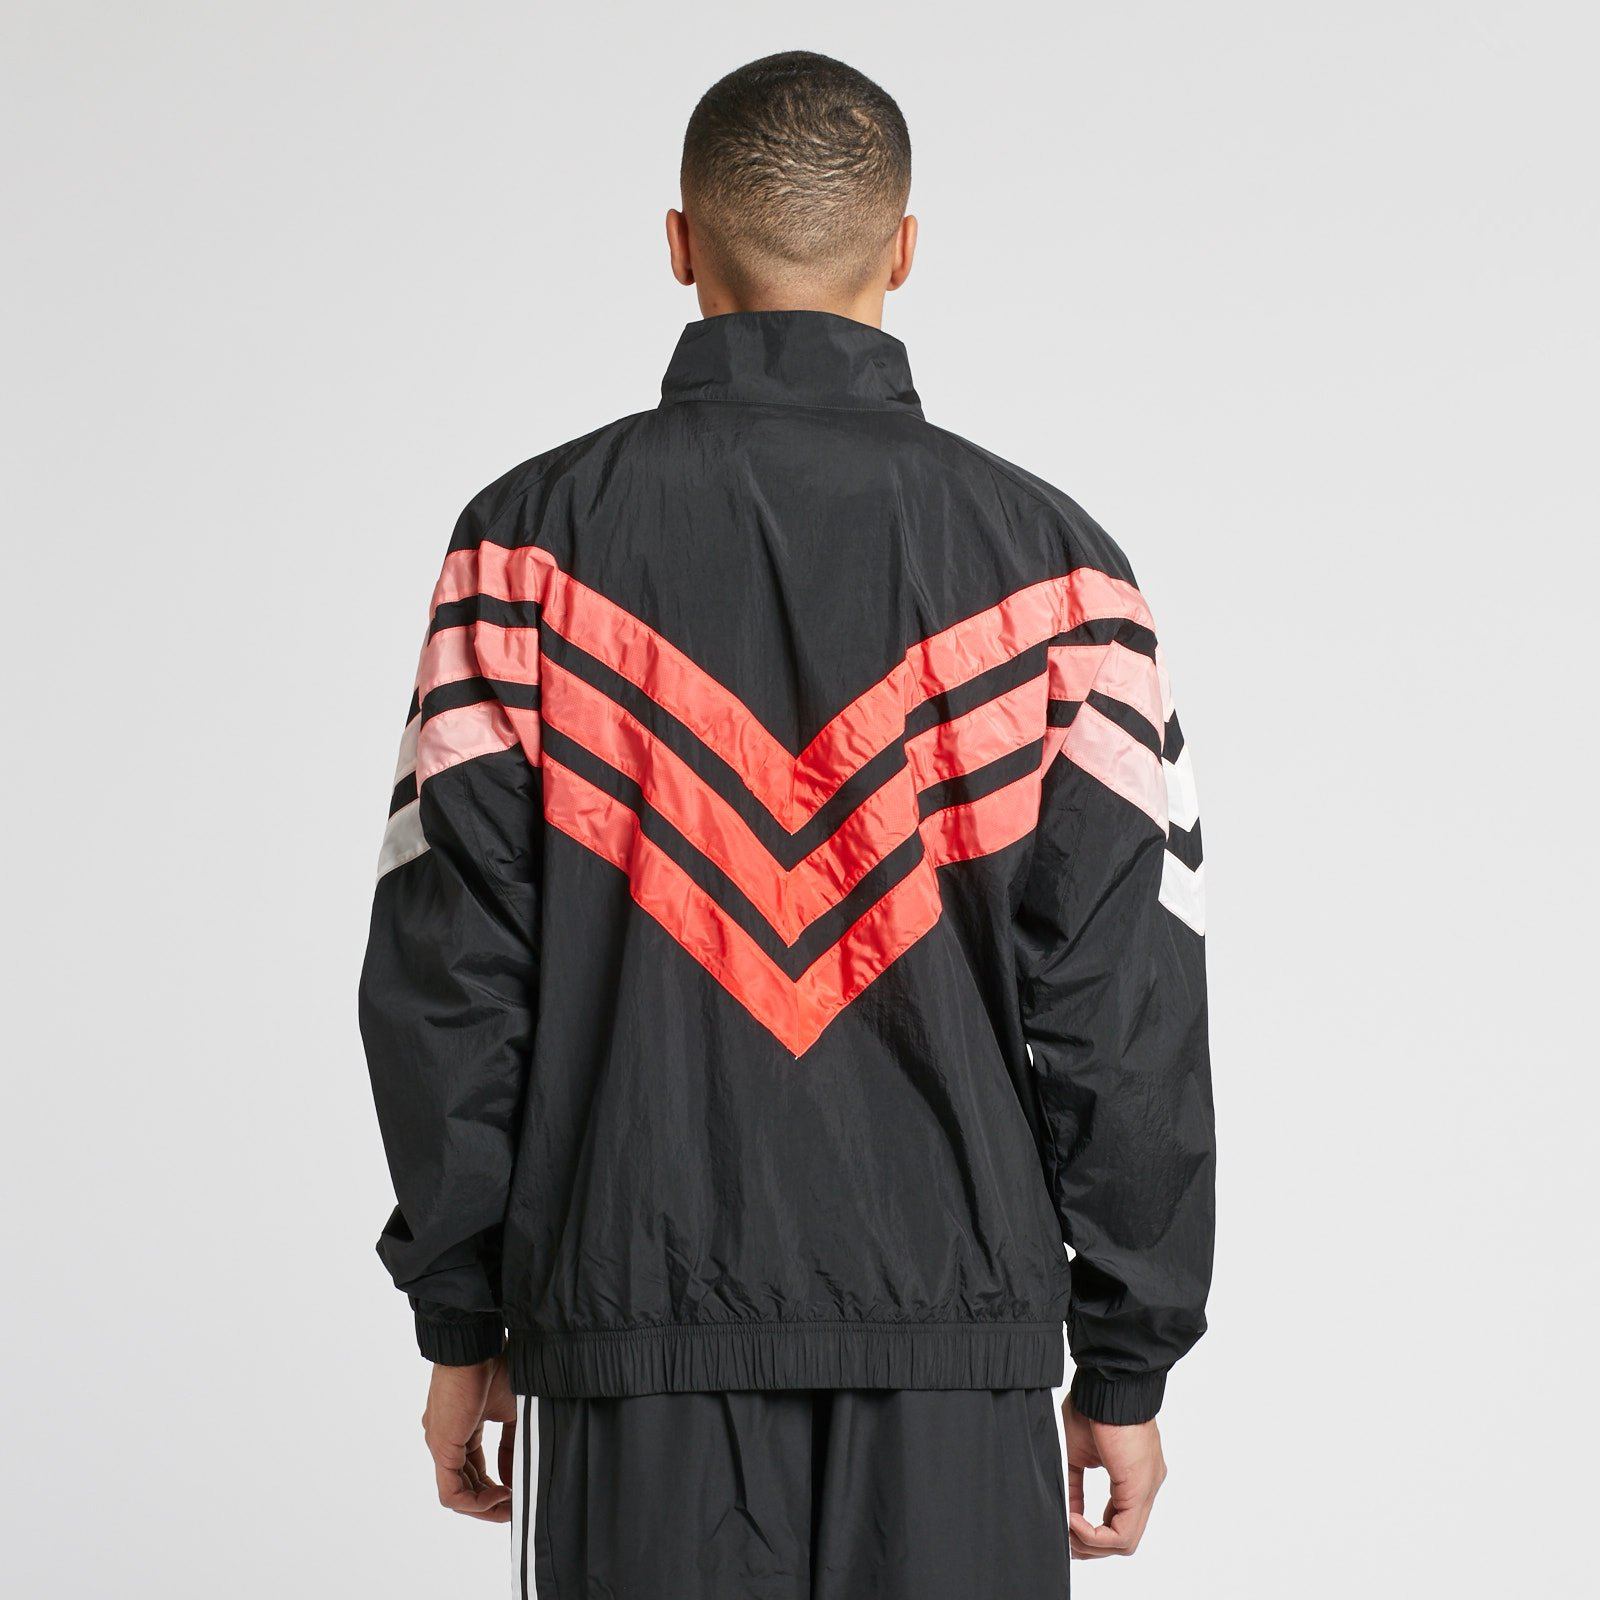 adidas Originals Zip Crew Tironti BlackGrey ThreeHI res Red